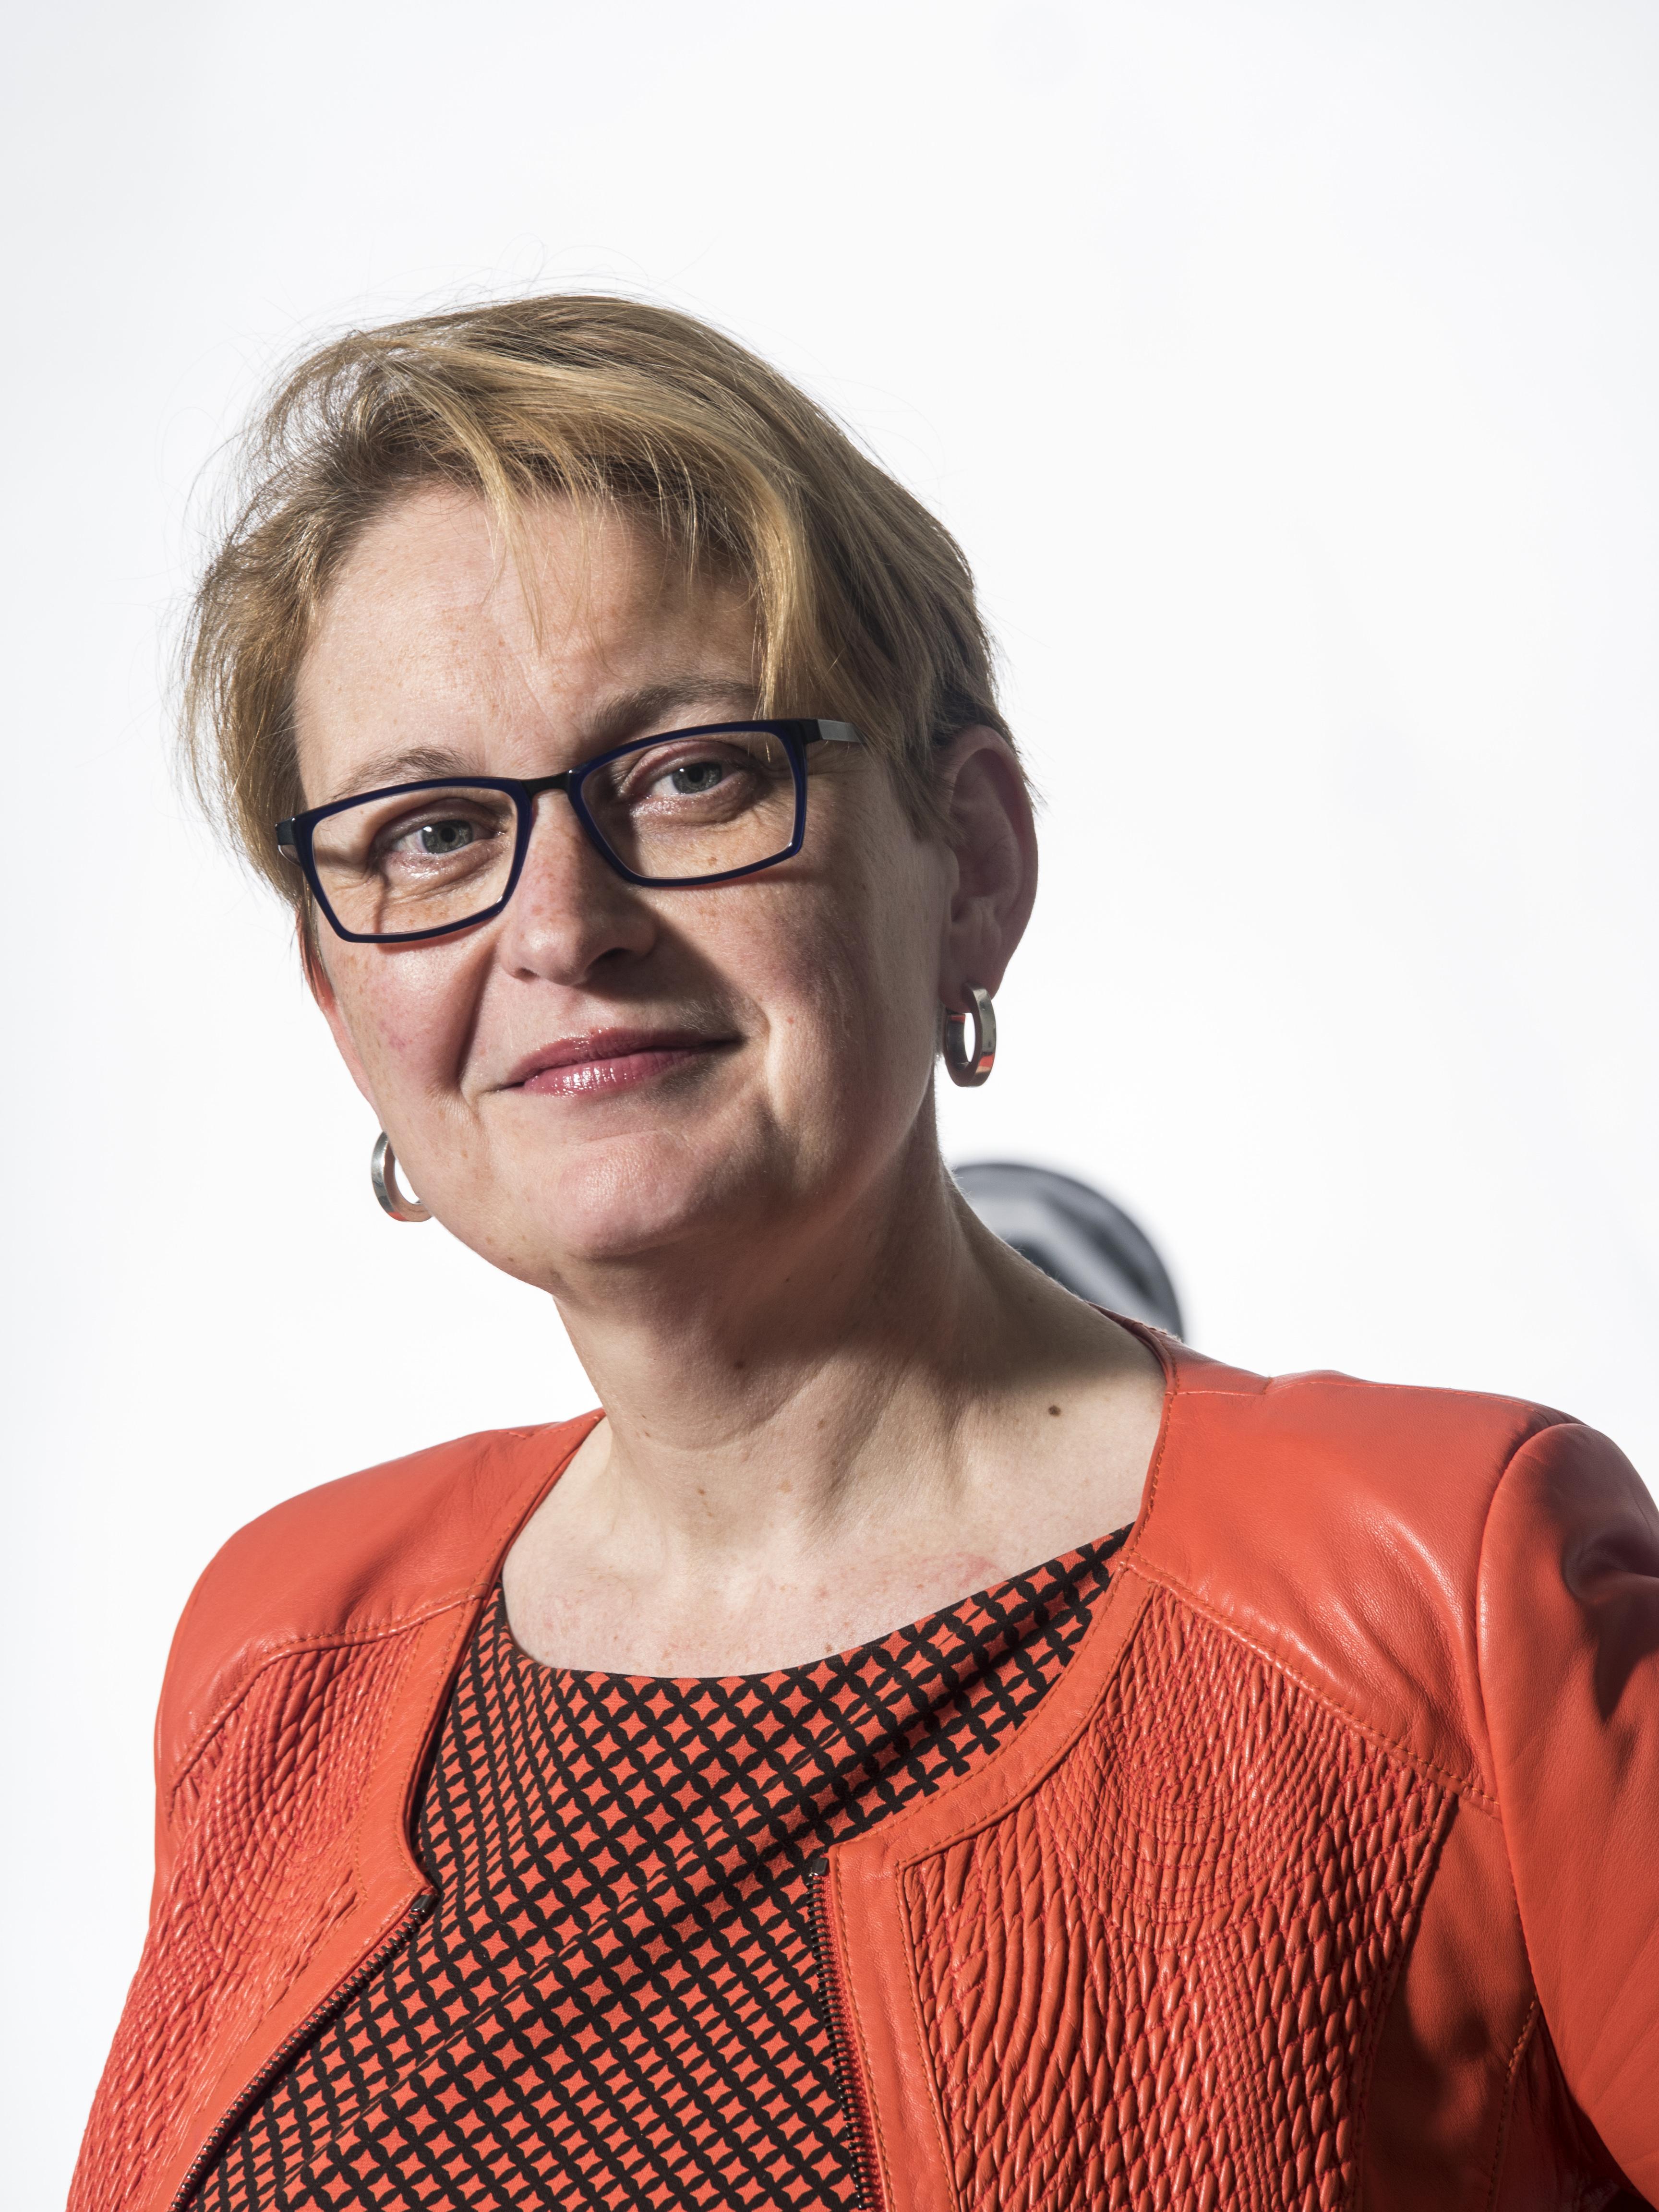 image of Cisca Wijmenga